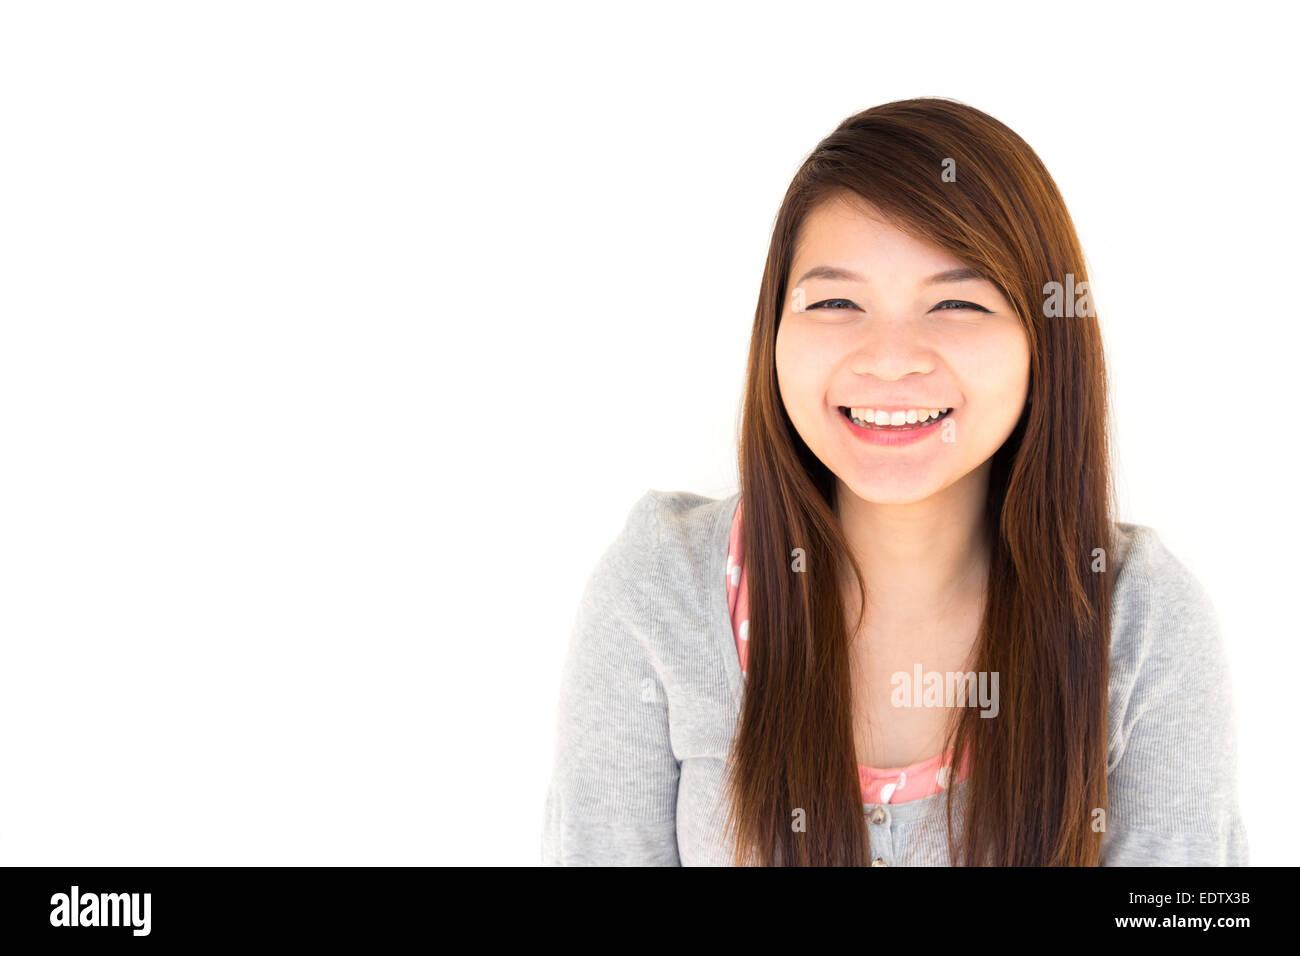 Make up tips for asian eyes